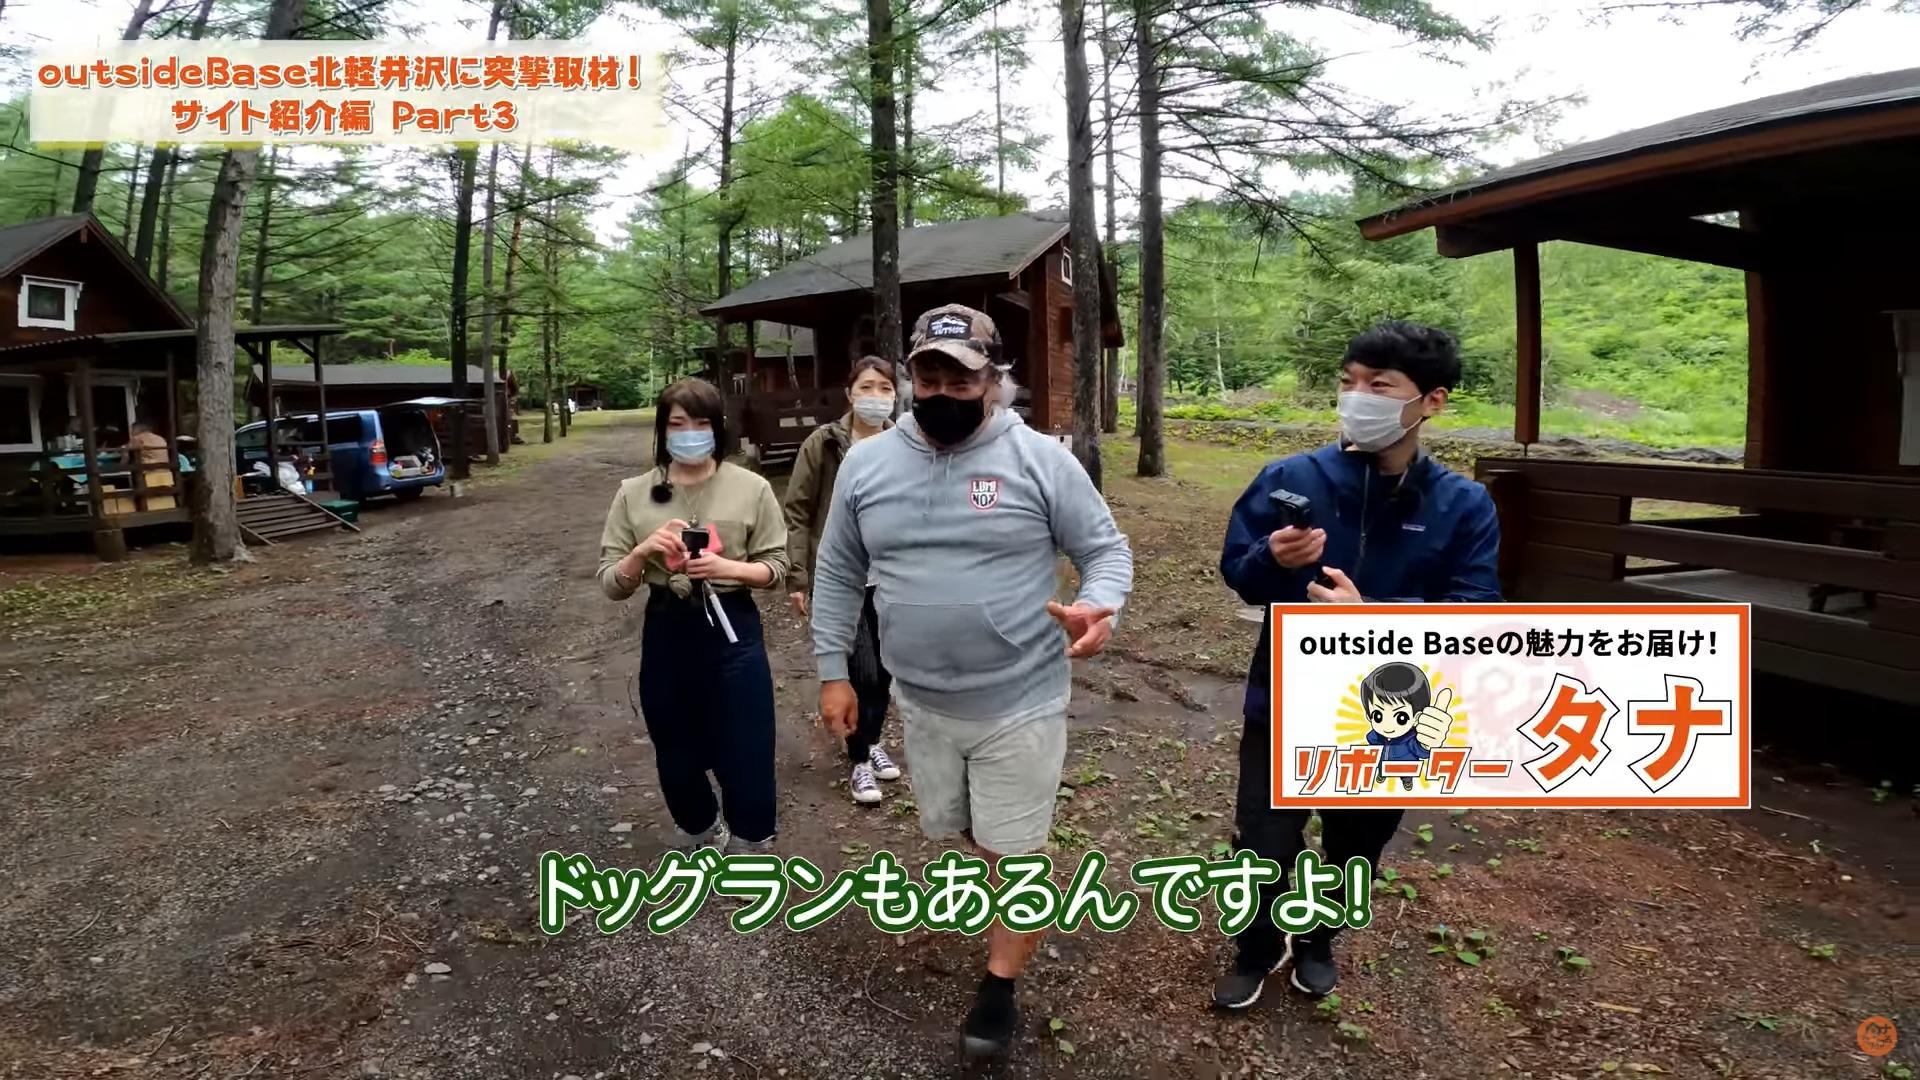 outsidebase北軽井沢 ドッグラン